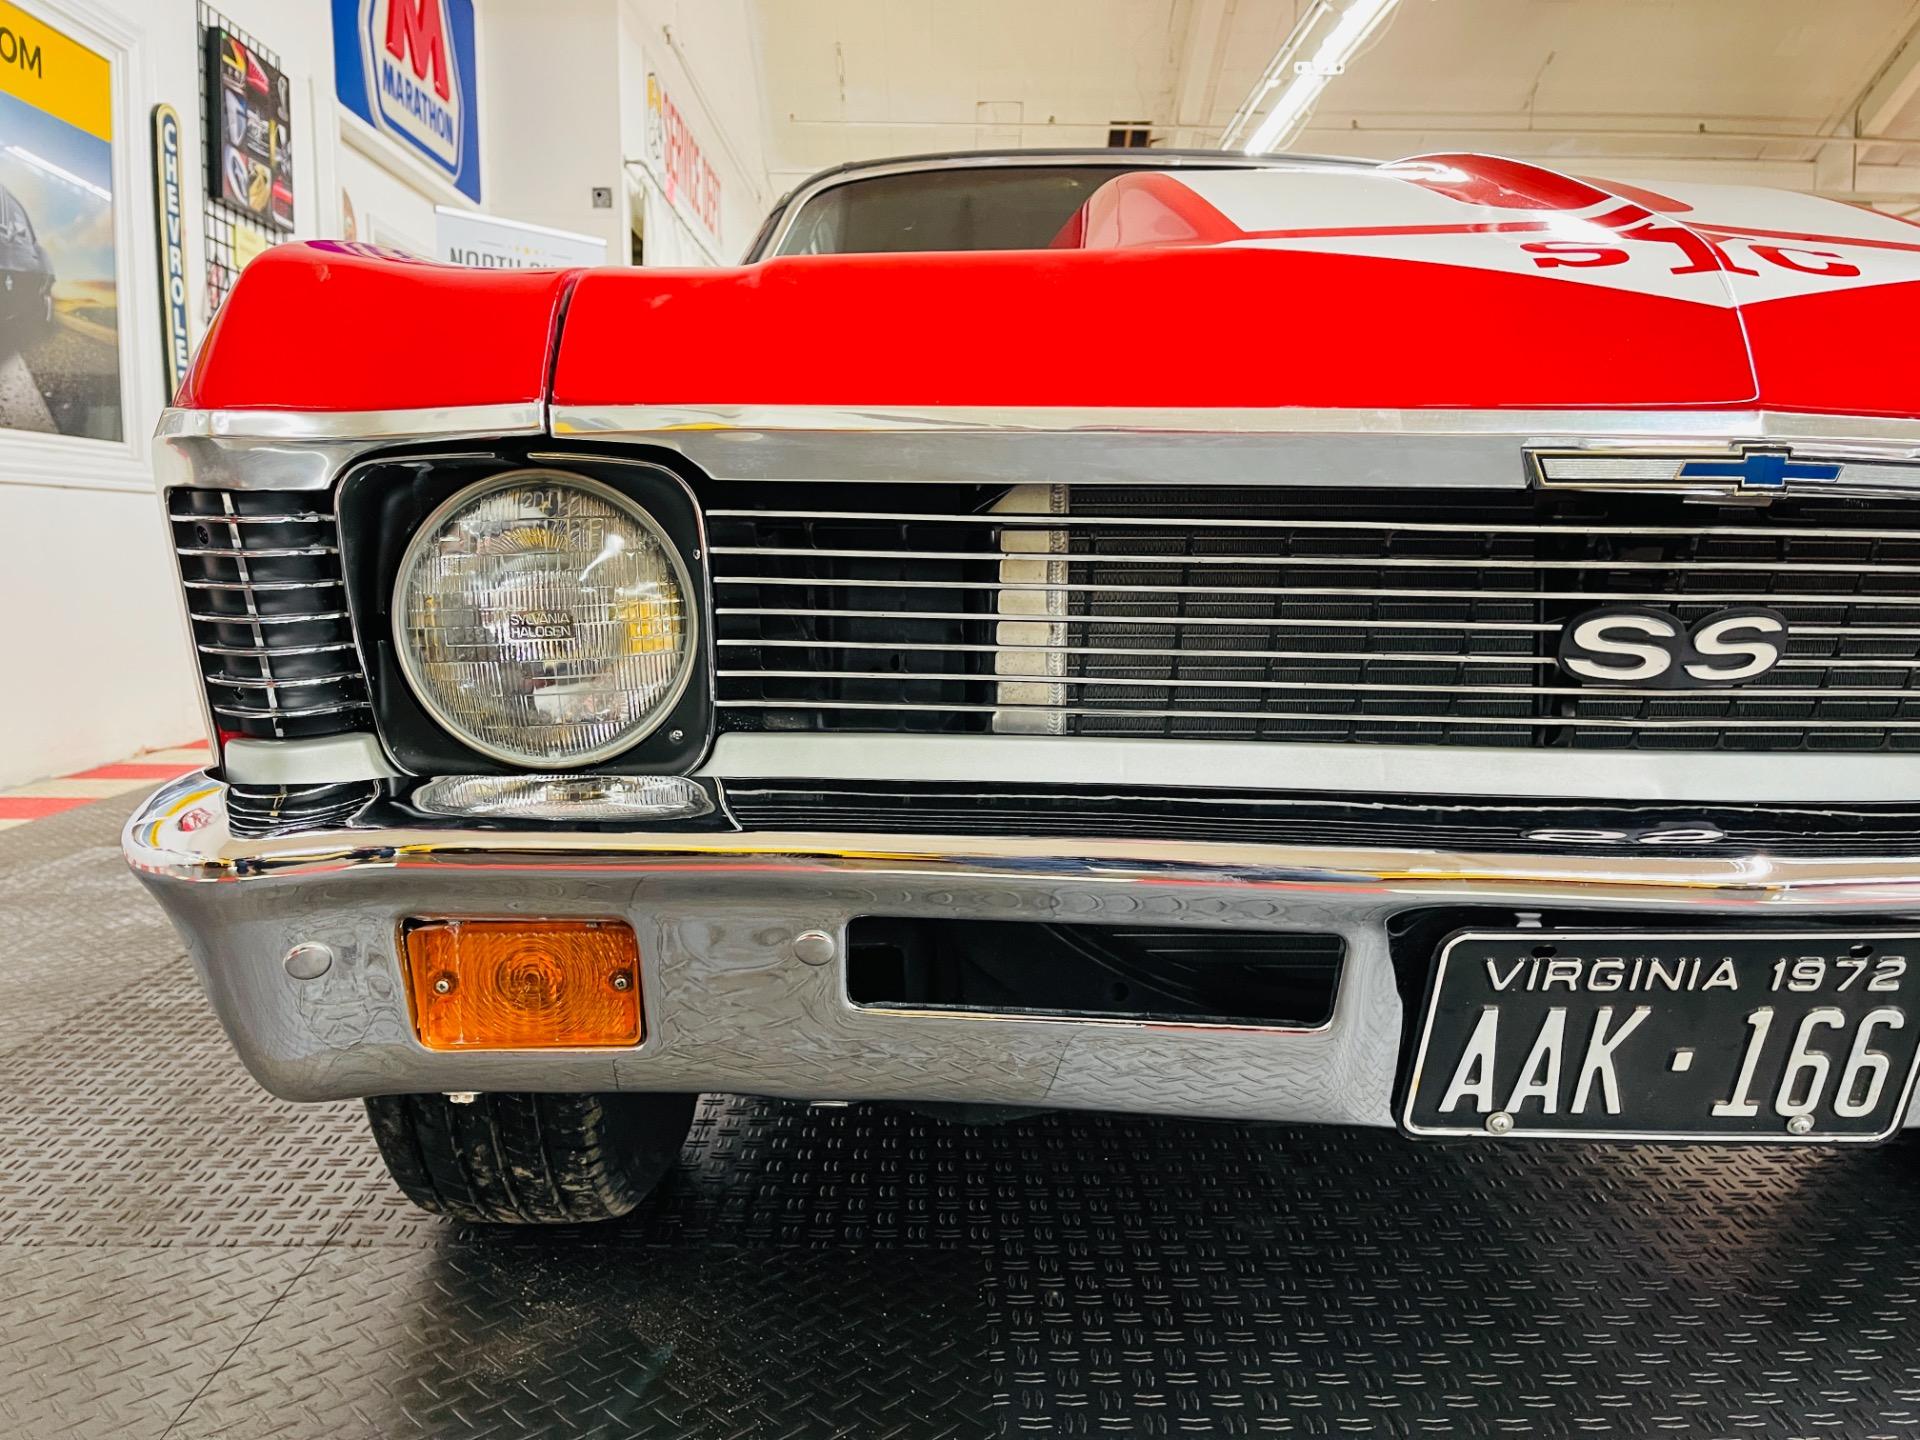 Used 1972 Chevrolet Nova - 427 YENKO TRIBUTE - CLEAN SOUTHERN NOVA - SEE VIDEO | Mundelein, IL